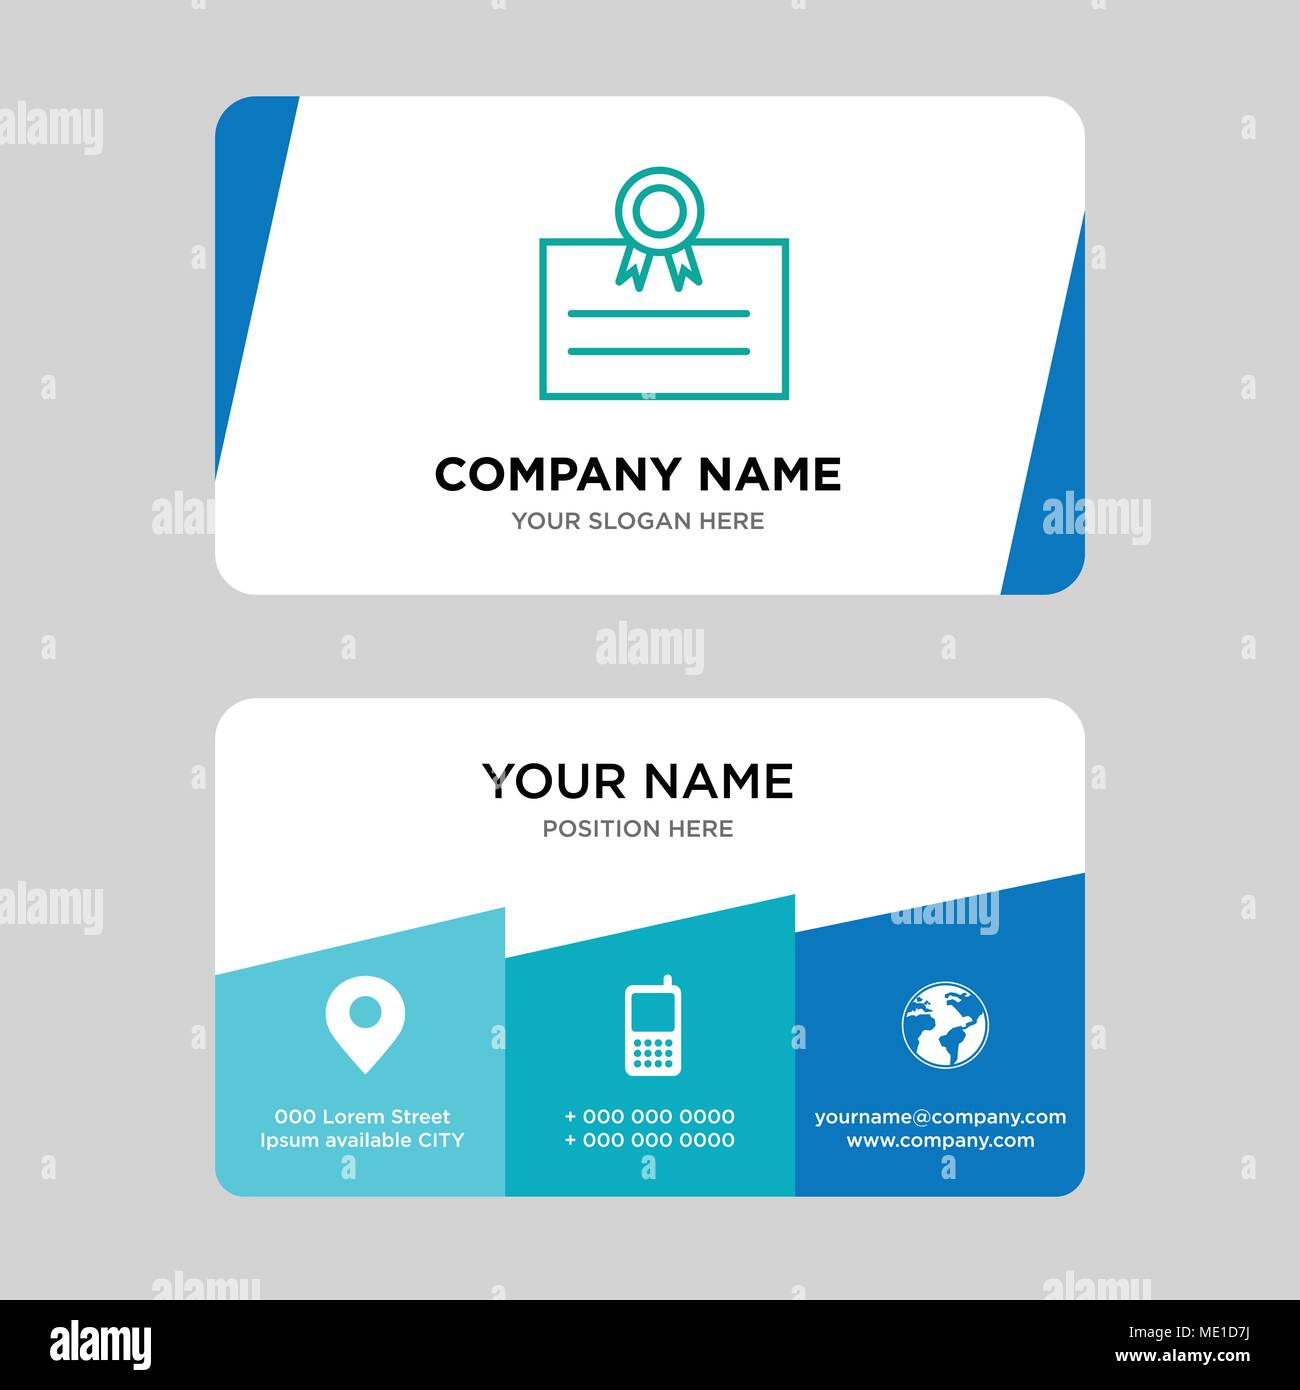 Official Postcard Stock Photos & Official Postcard Stock Images - Alamy